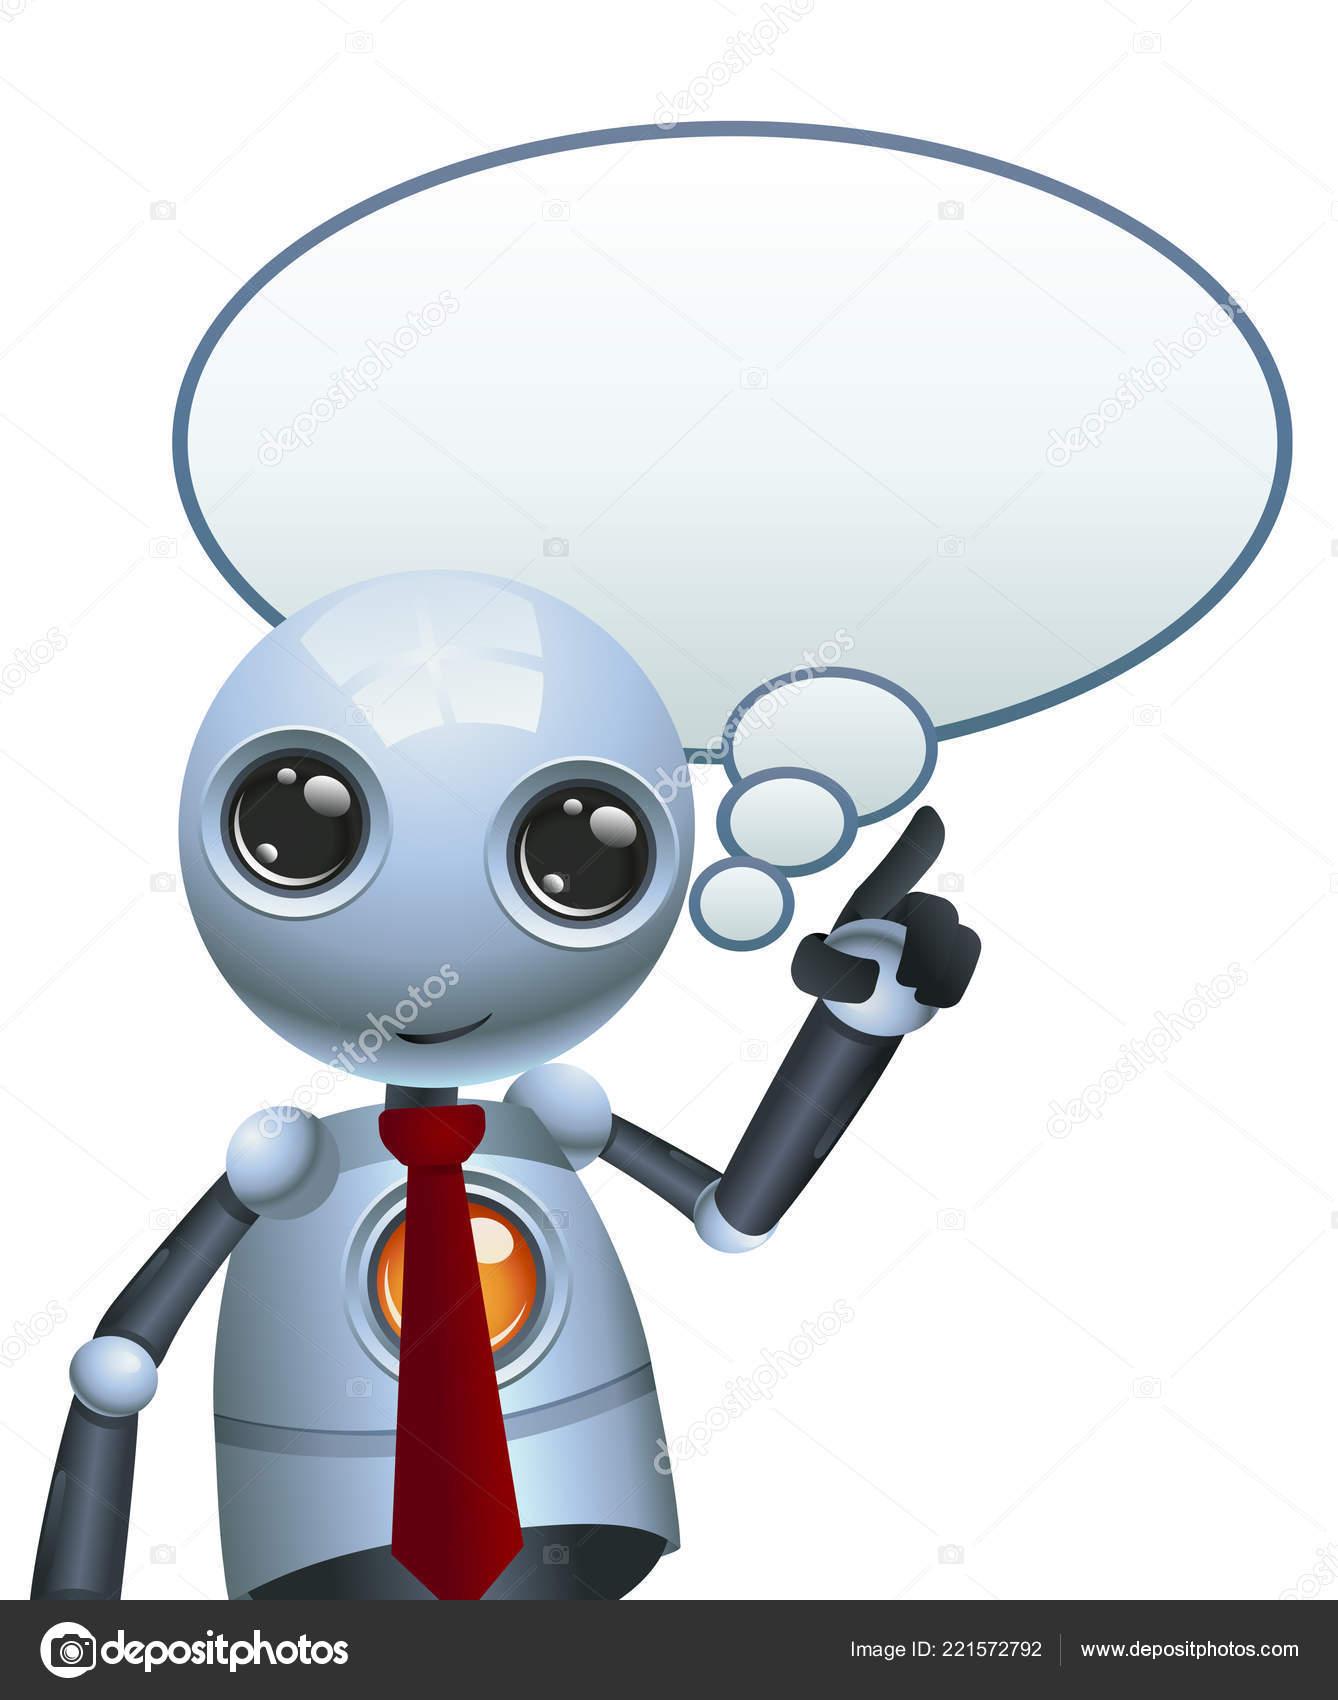 Ilustrace Stastny Droid Robot Kresba Myslel Bublina Izolovane Bilem